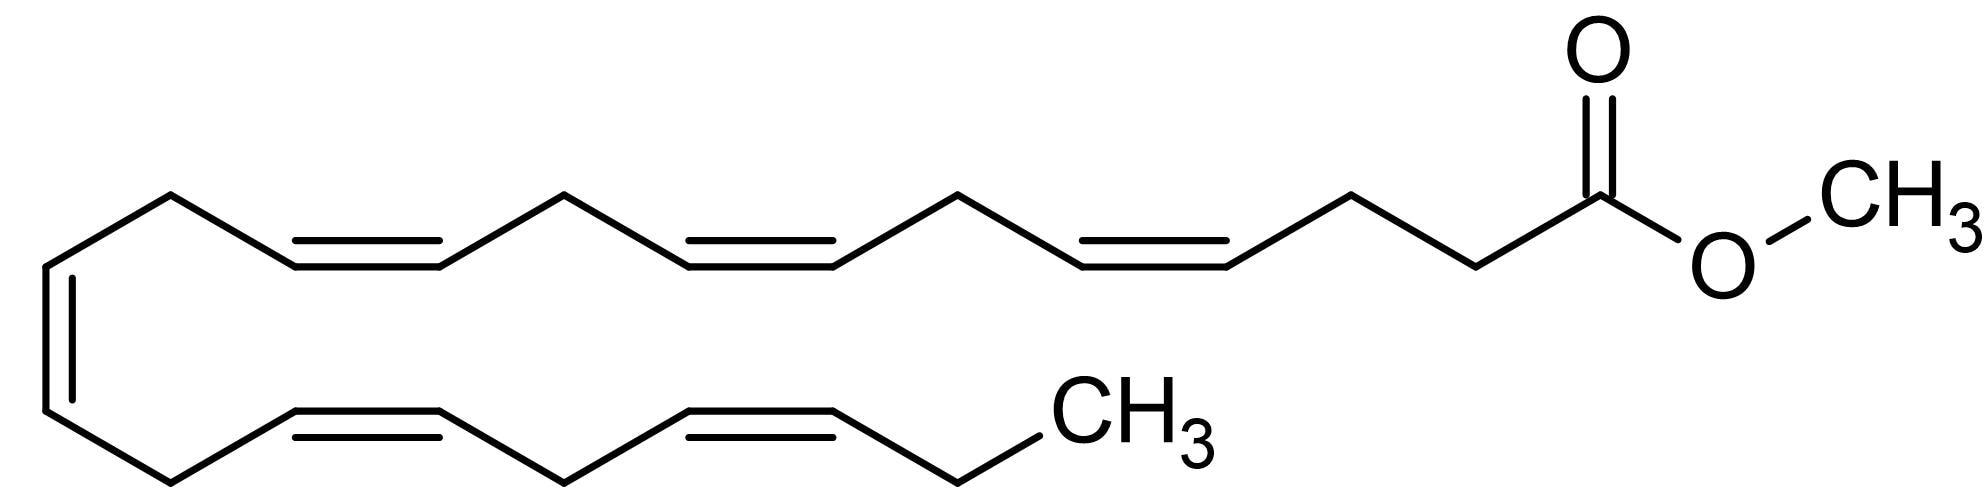 Chemical Structure - cis-4,7,10,13,16,19-Docosahexaenoic acid methyl ester, docosahexaenoic acid methyl ester (ab144976)